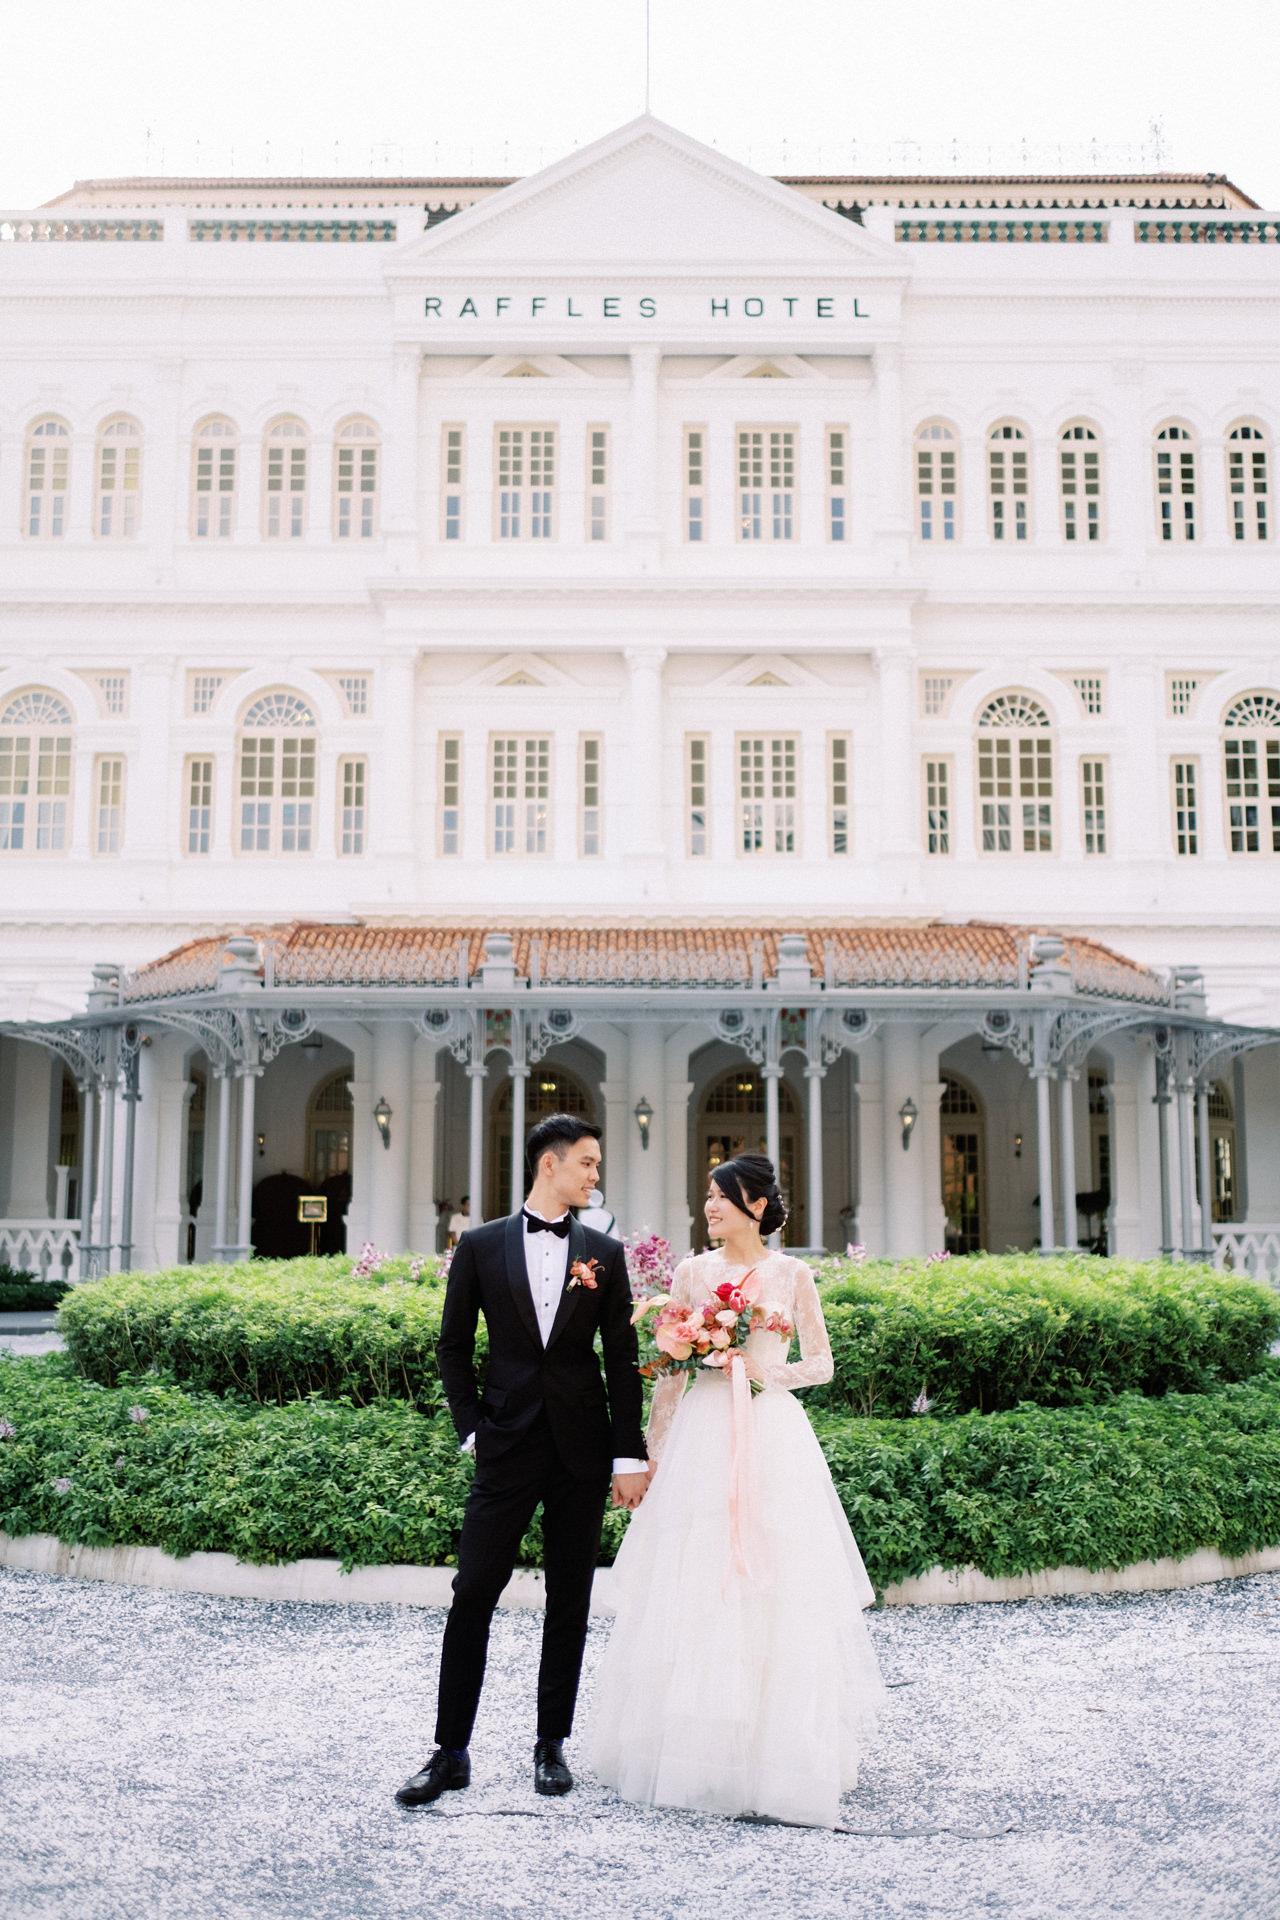 Elegant Raffles Hotel Singapore Wedding 37